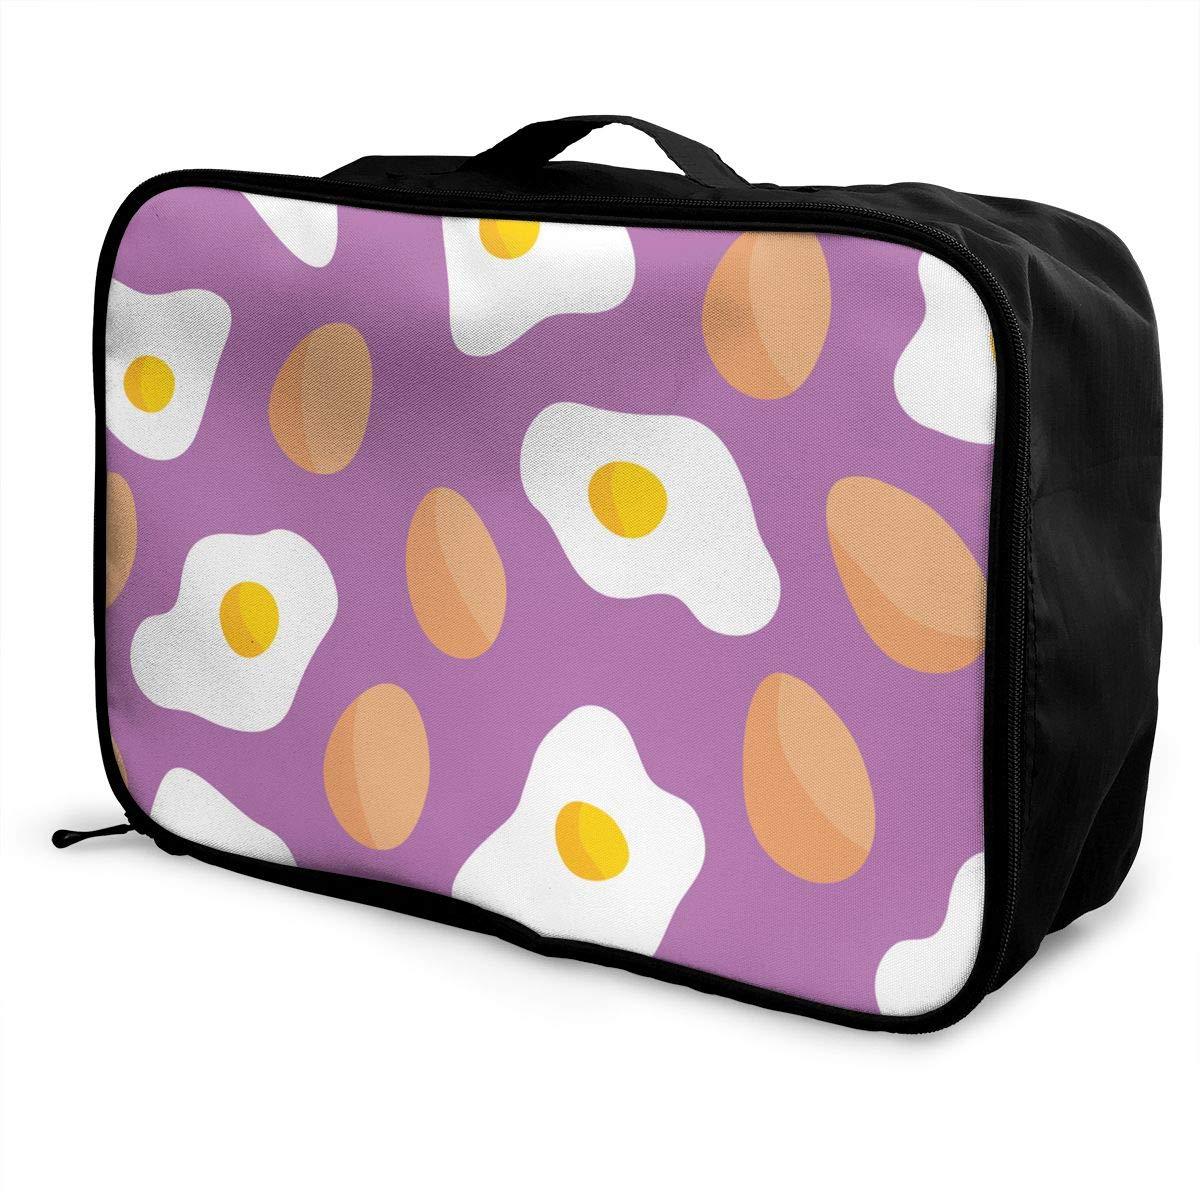 Travel Luggage Duffle Bag Lightweight Portable Handbag Egg Large Capacity Waterproof Foldable Storage Tote